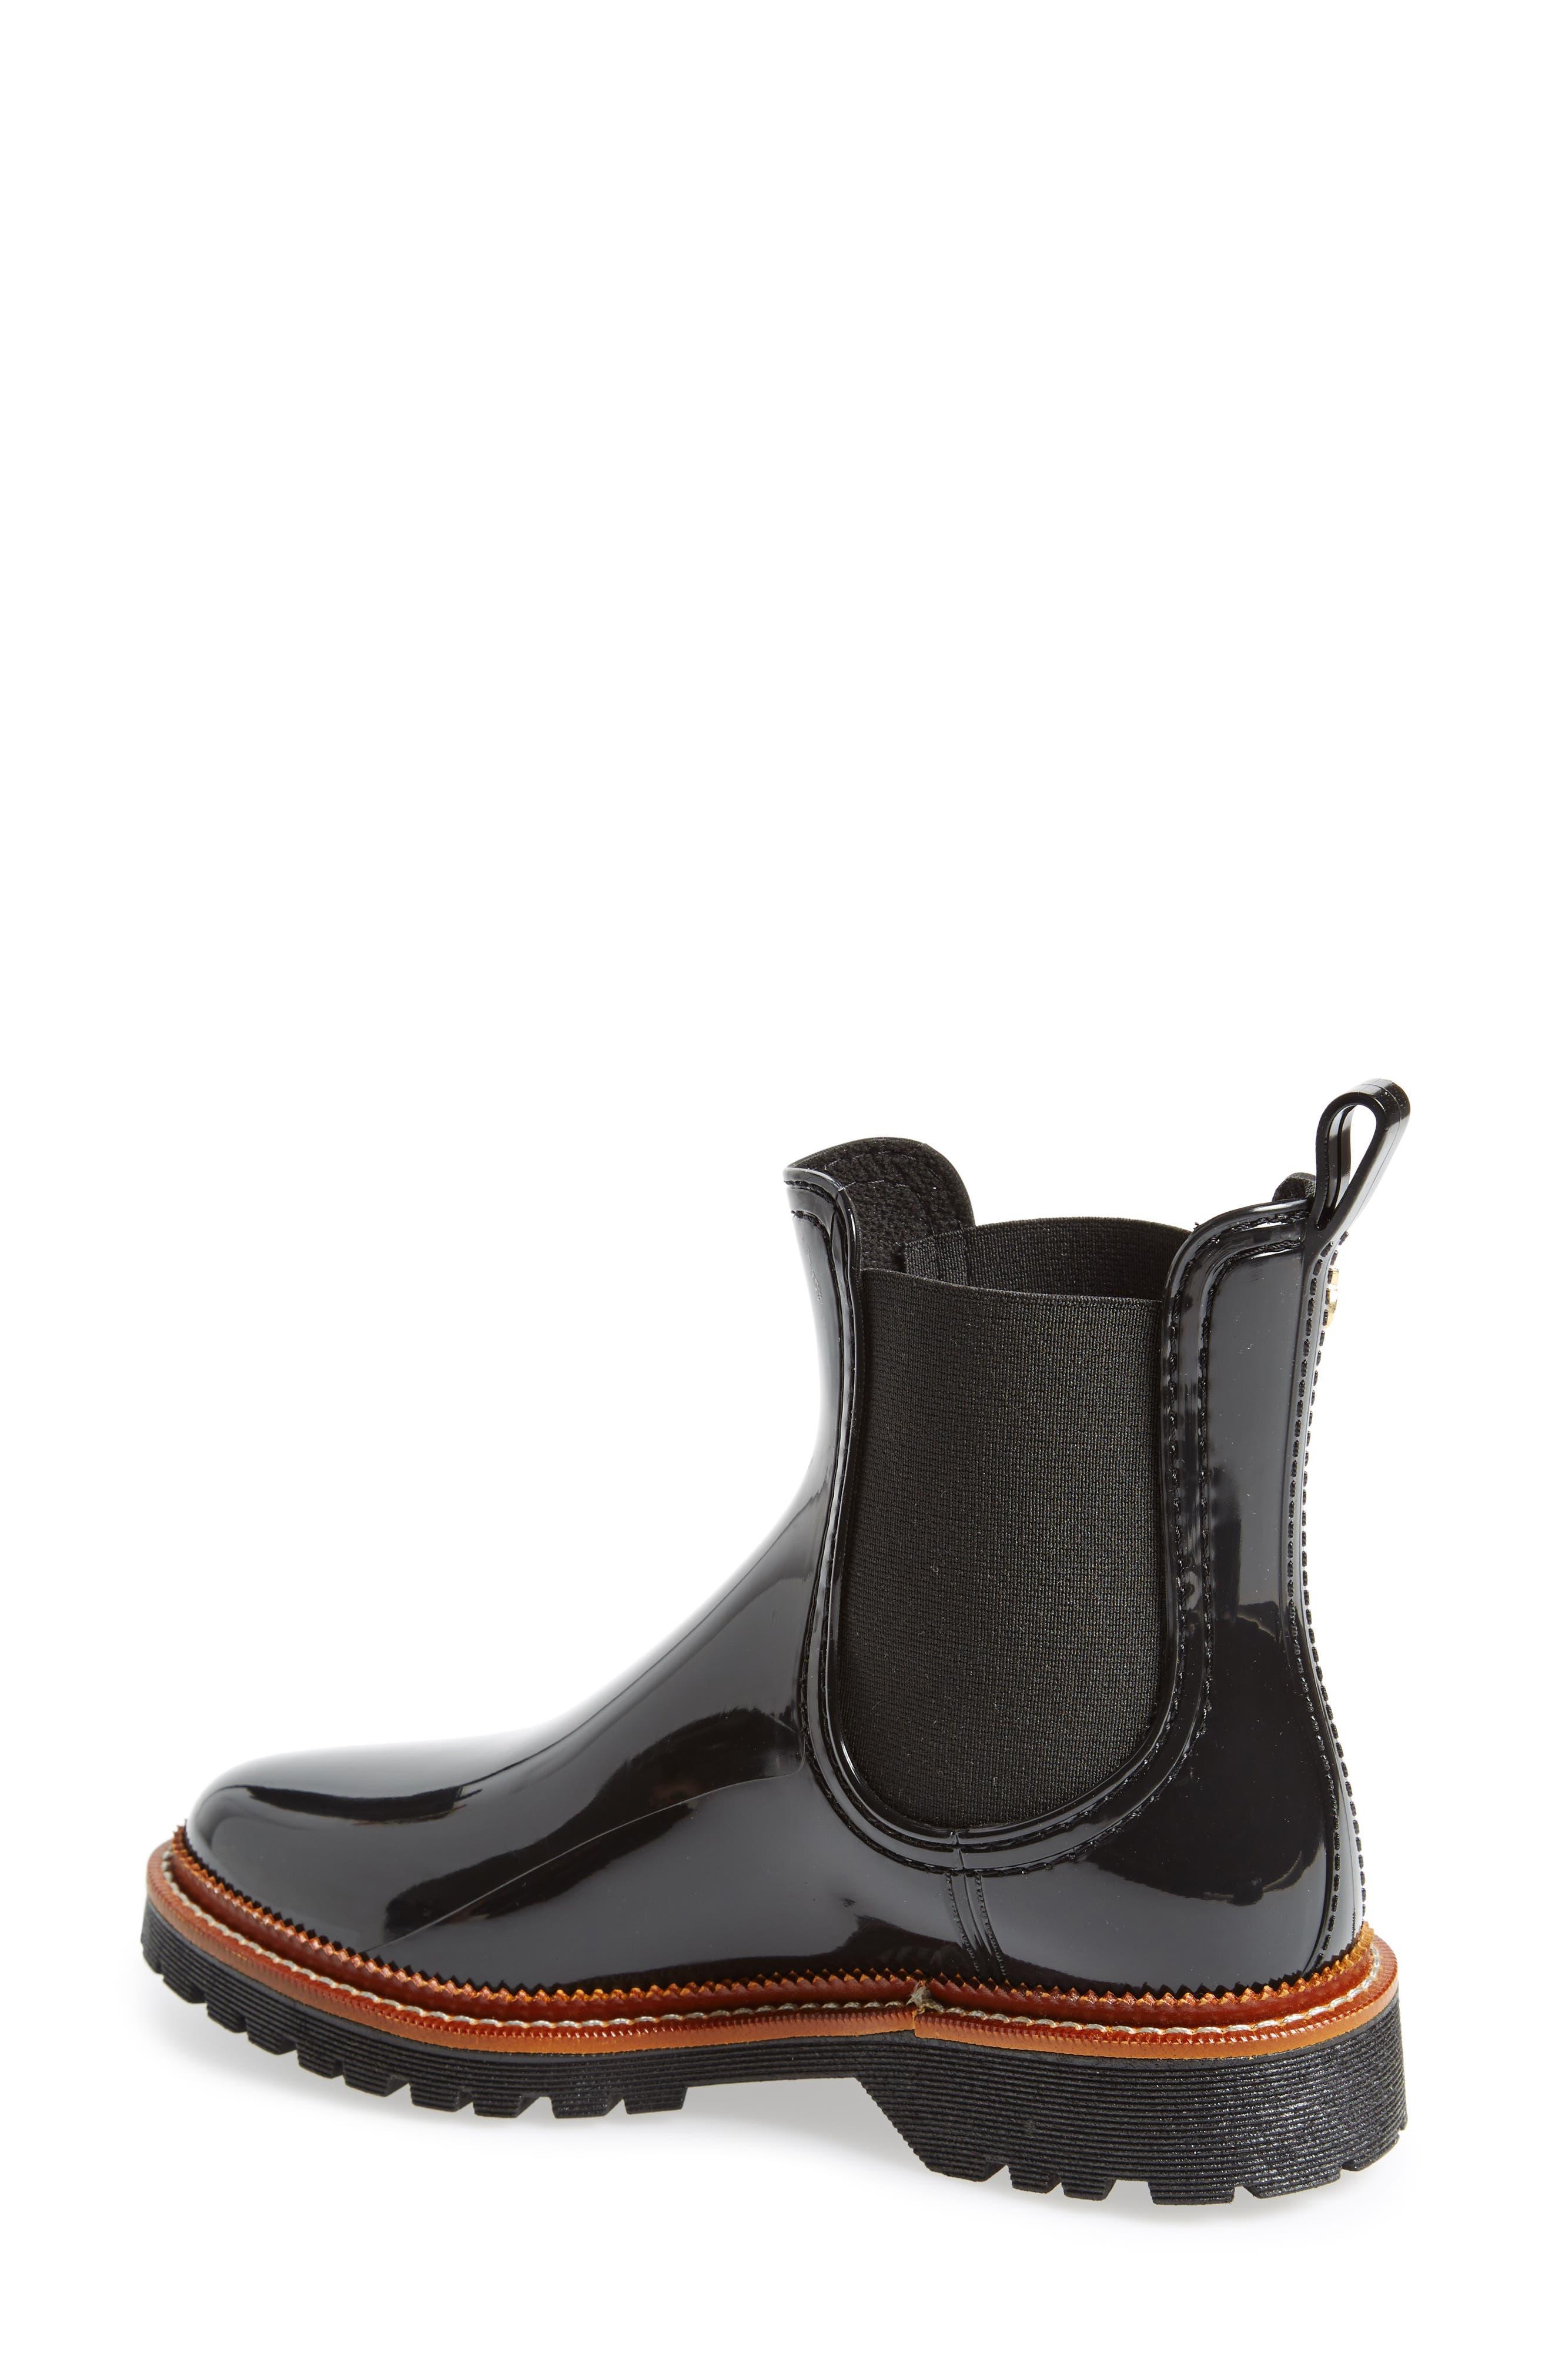 April Waterproof Chelsea Boot,                             Alternate thumbnail 2, color,                             Black Gloss